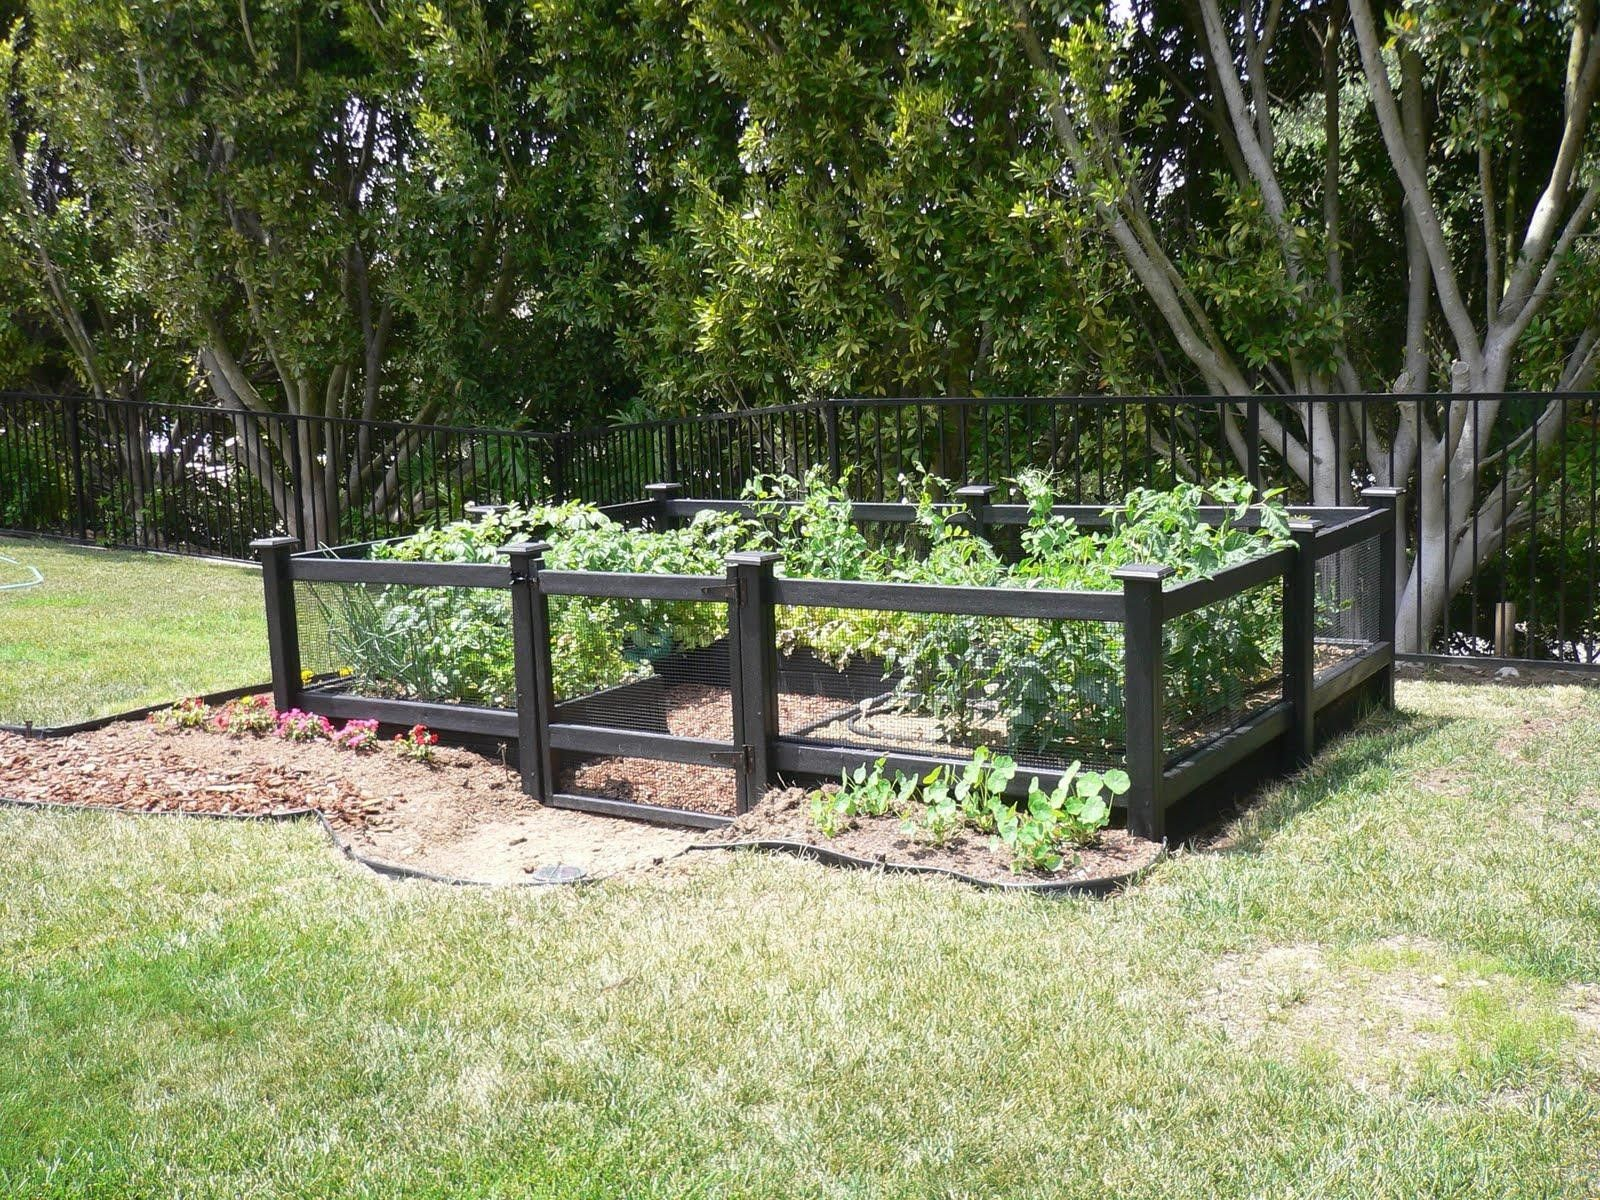 Engrossing Vegetable Garden Ideas On A Budget Garden Fence Kit Garden Fence Kit Garden Garden I Cheap Garden Fencing Fenced Vegetable Garden Small Garden Fence